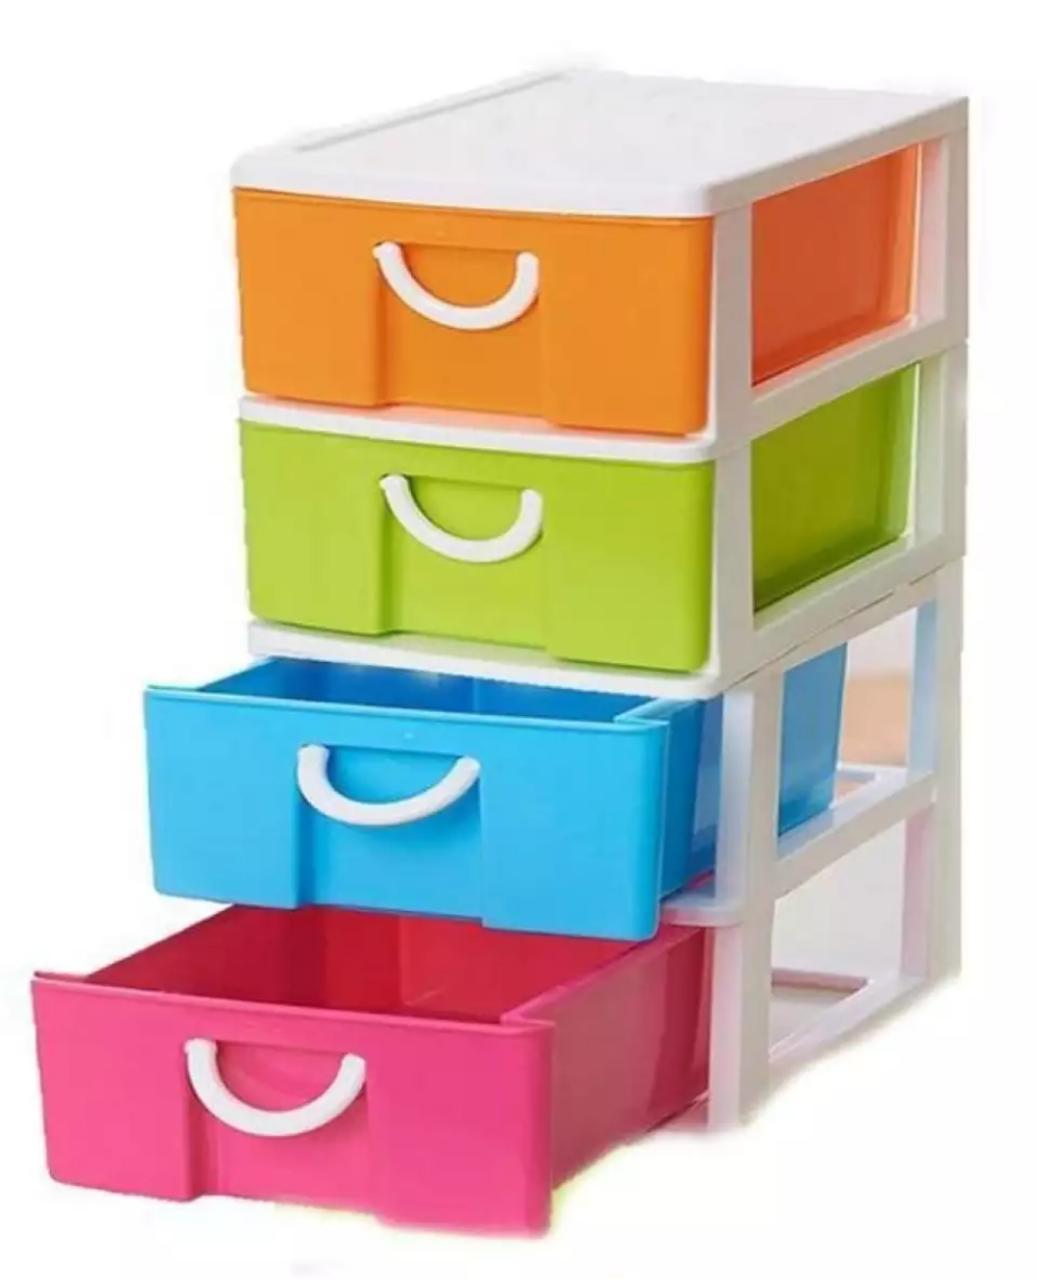 4 Tier Cosmetics Items Storage Organizer - Colorful